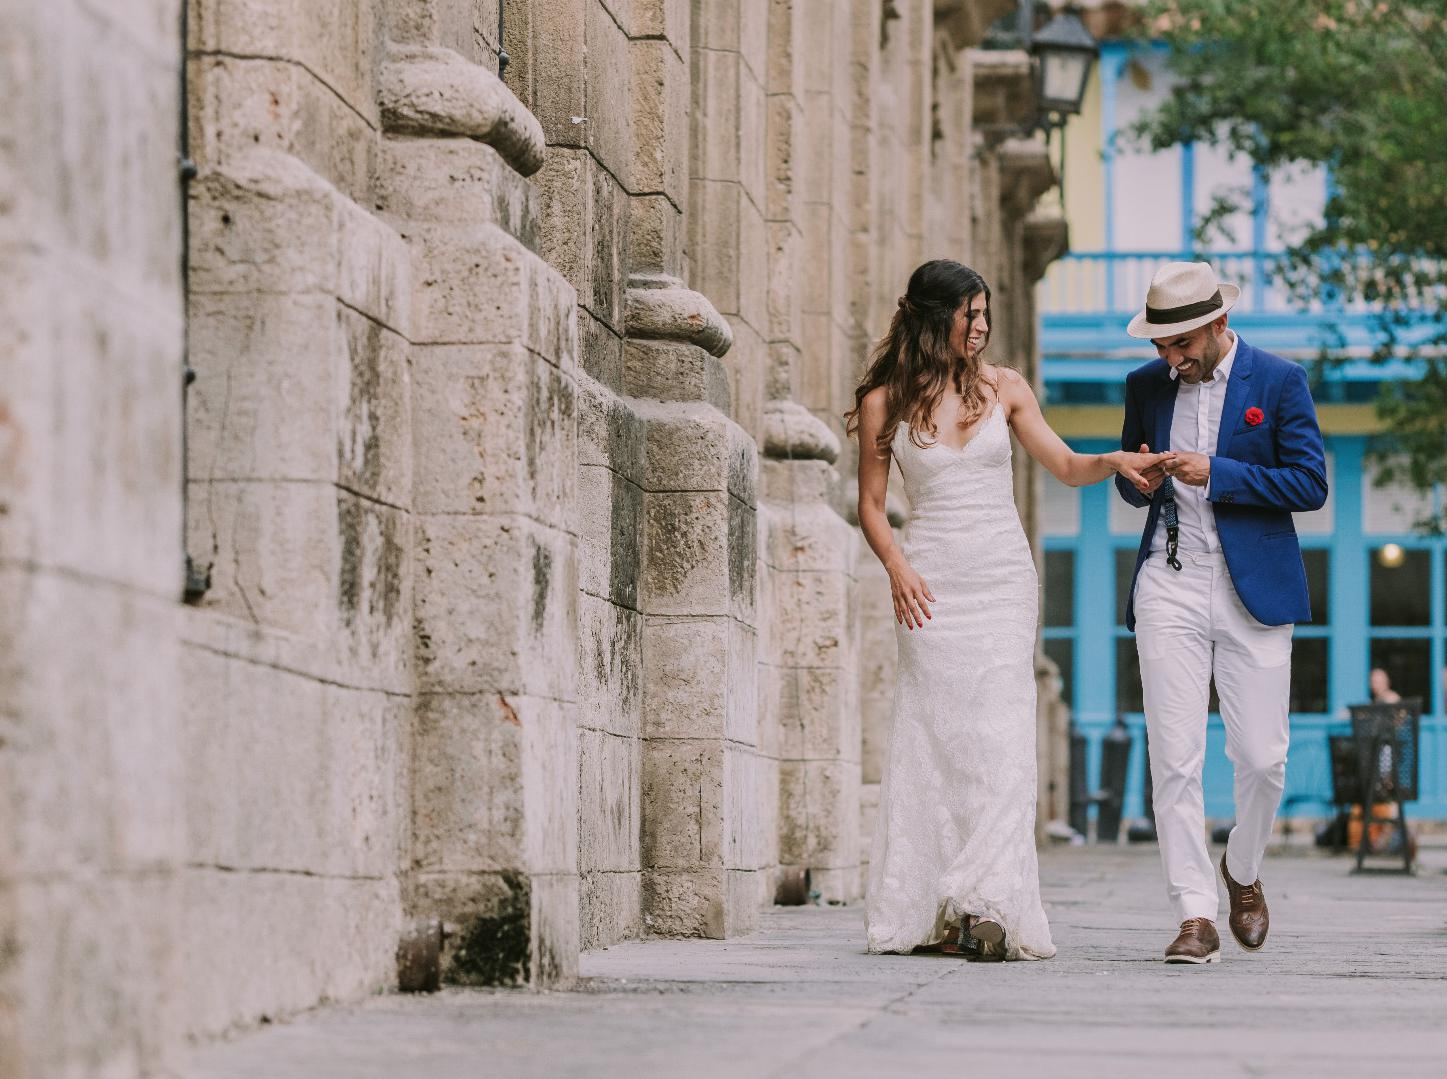 weddings-sin-clasificar-no-theme-cuba-28822.jpg